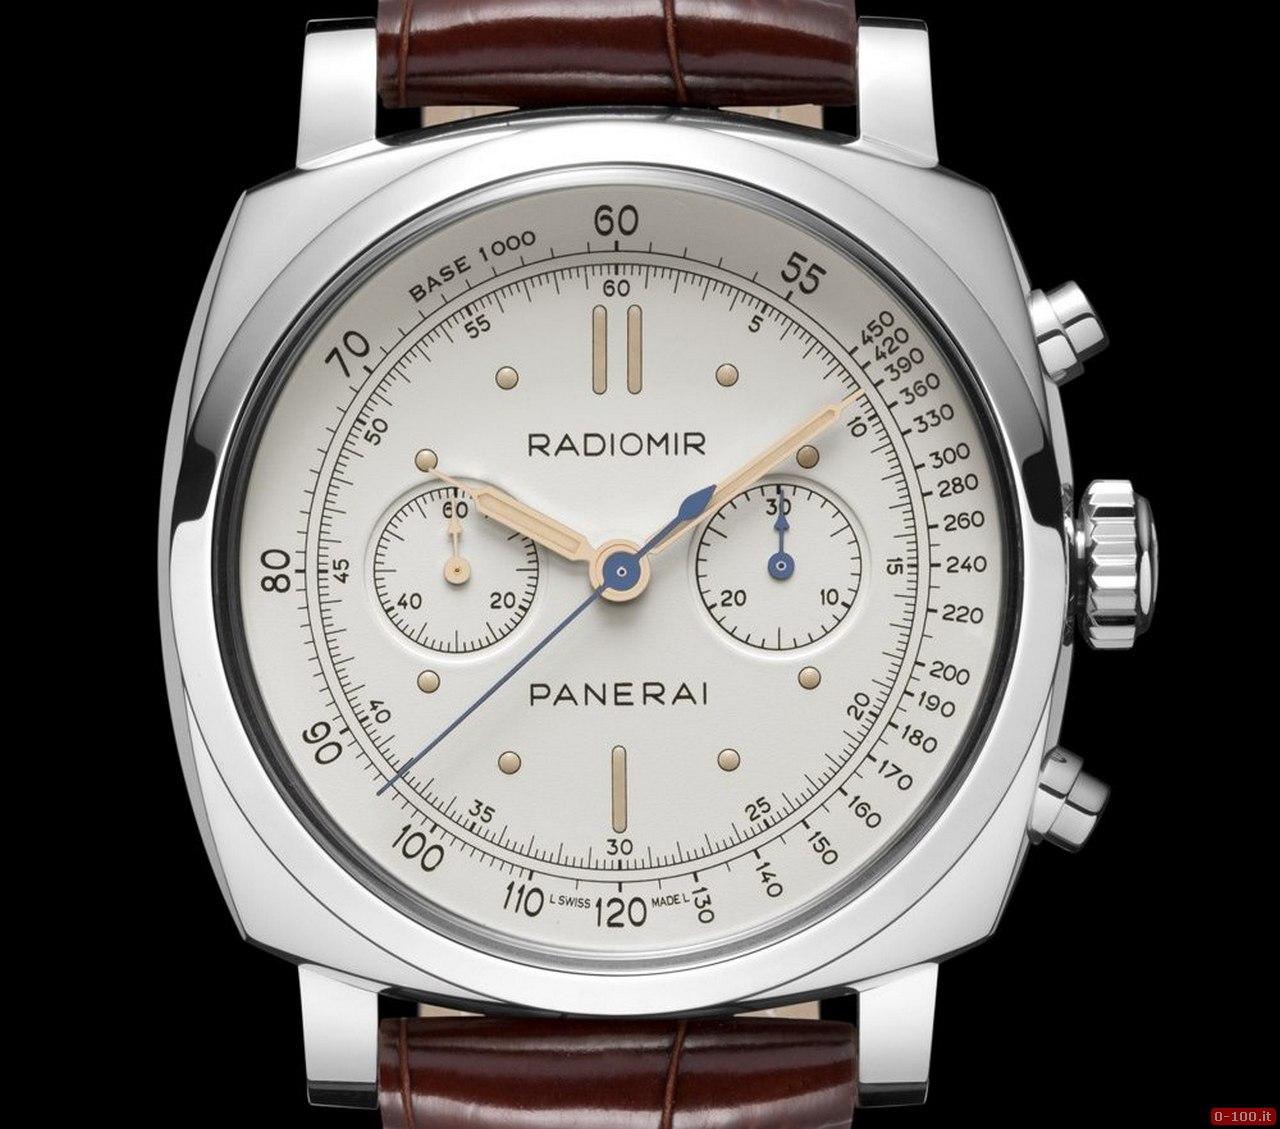 sihh-2014-panerai-radiomir-1940-chronograph-collection-limited-edition_0-100_12